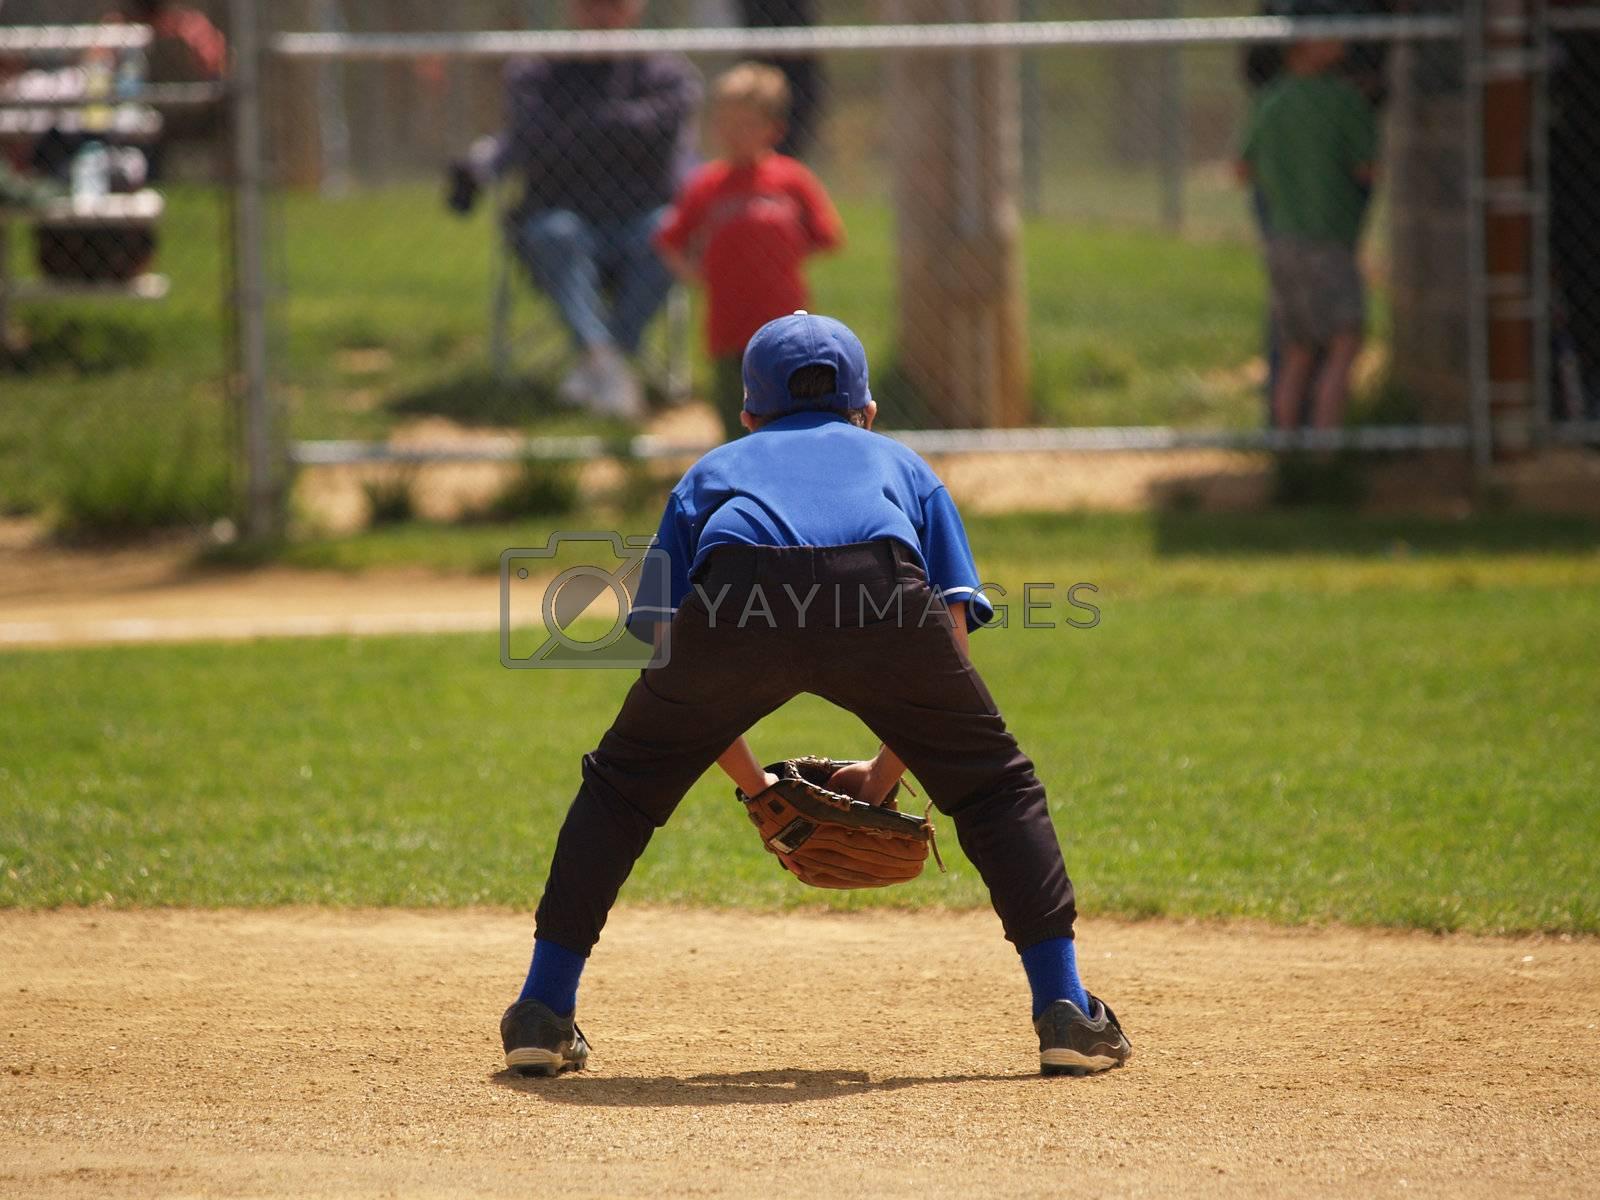 back view of a little league baseball player